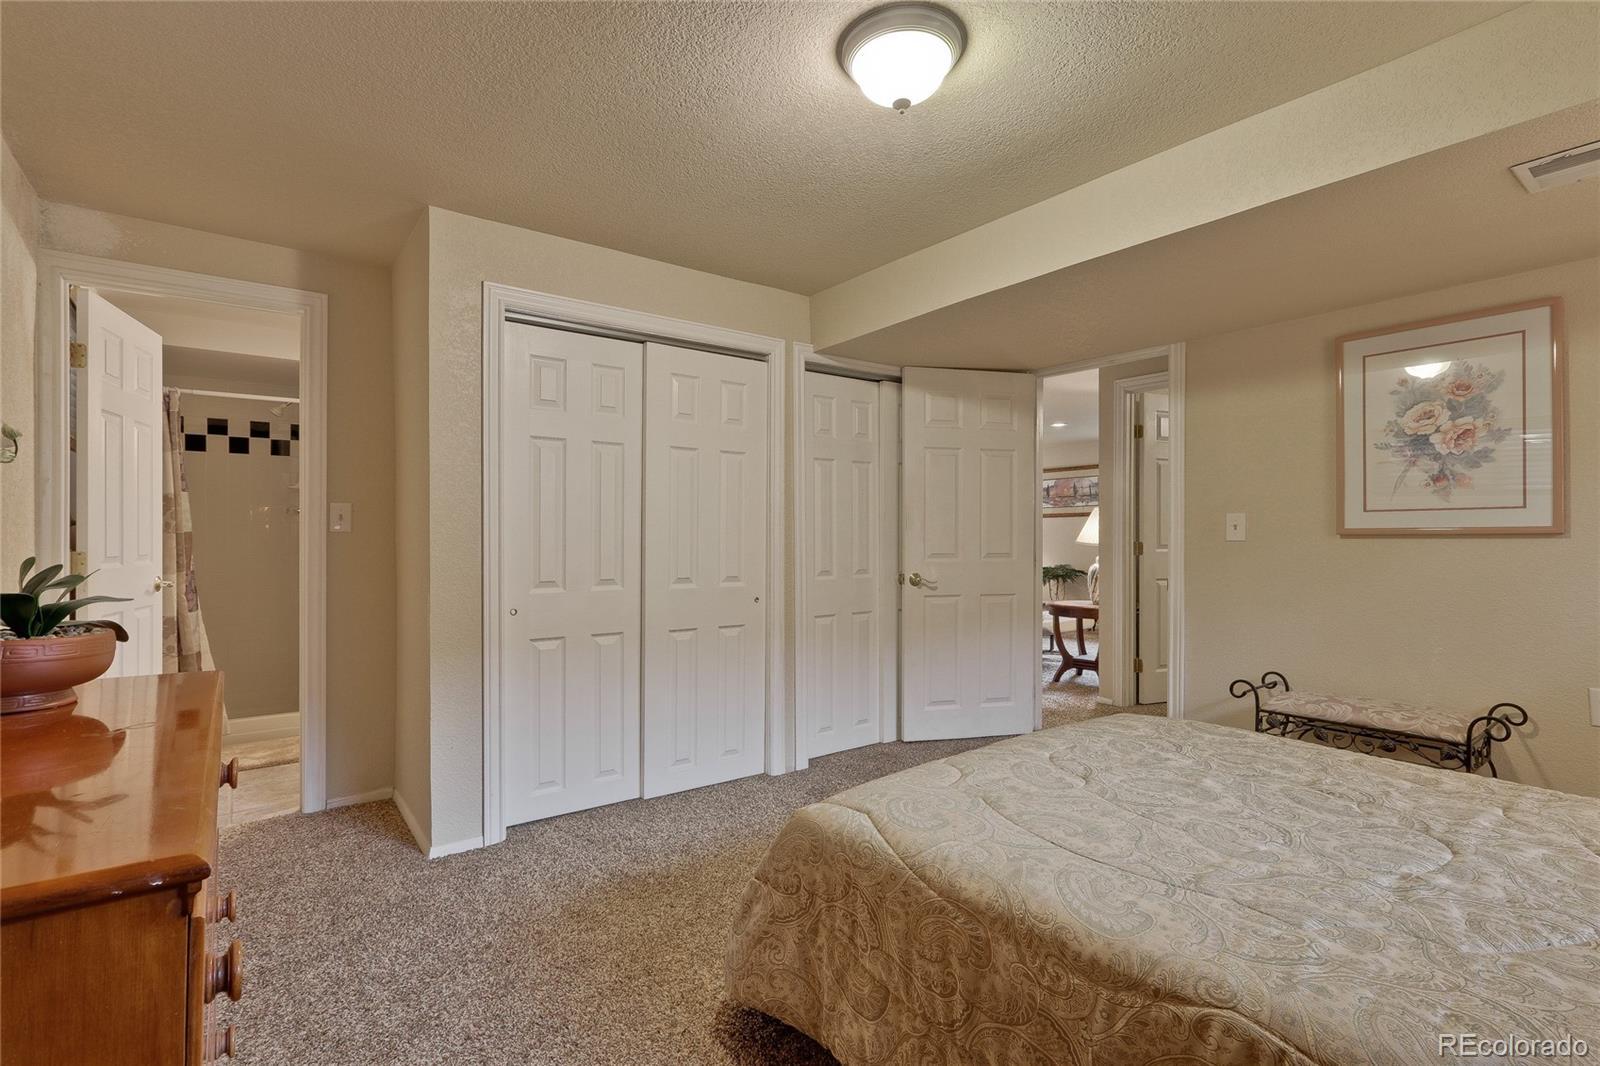 MLS# 6751608 - 27 - 12838 W Arizona Place, Lakewood, CO 80228